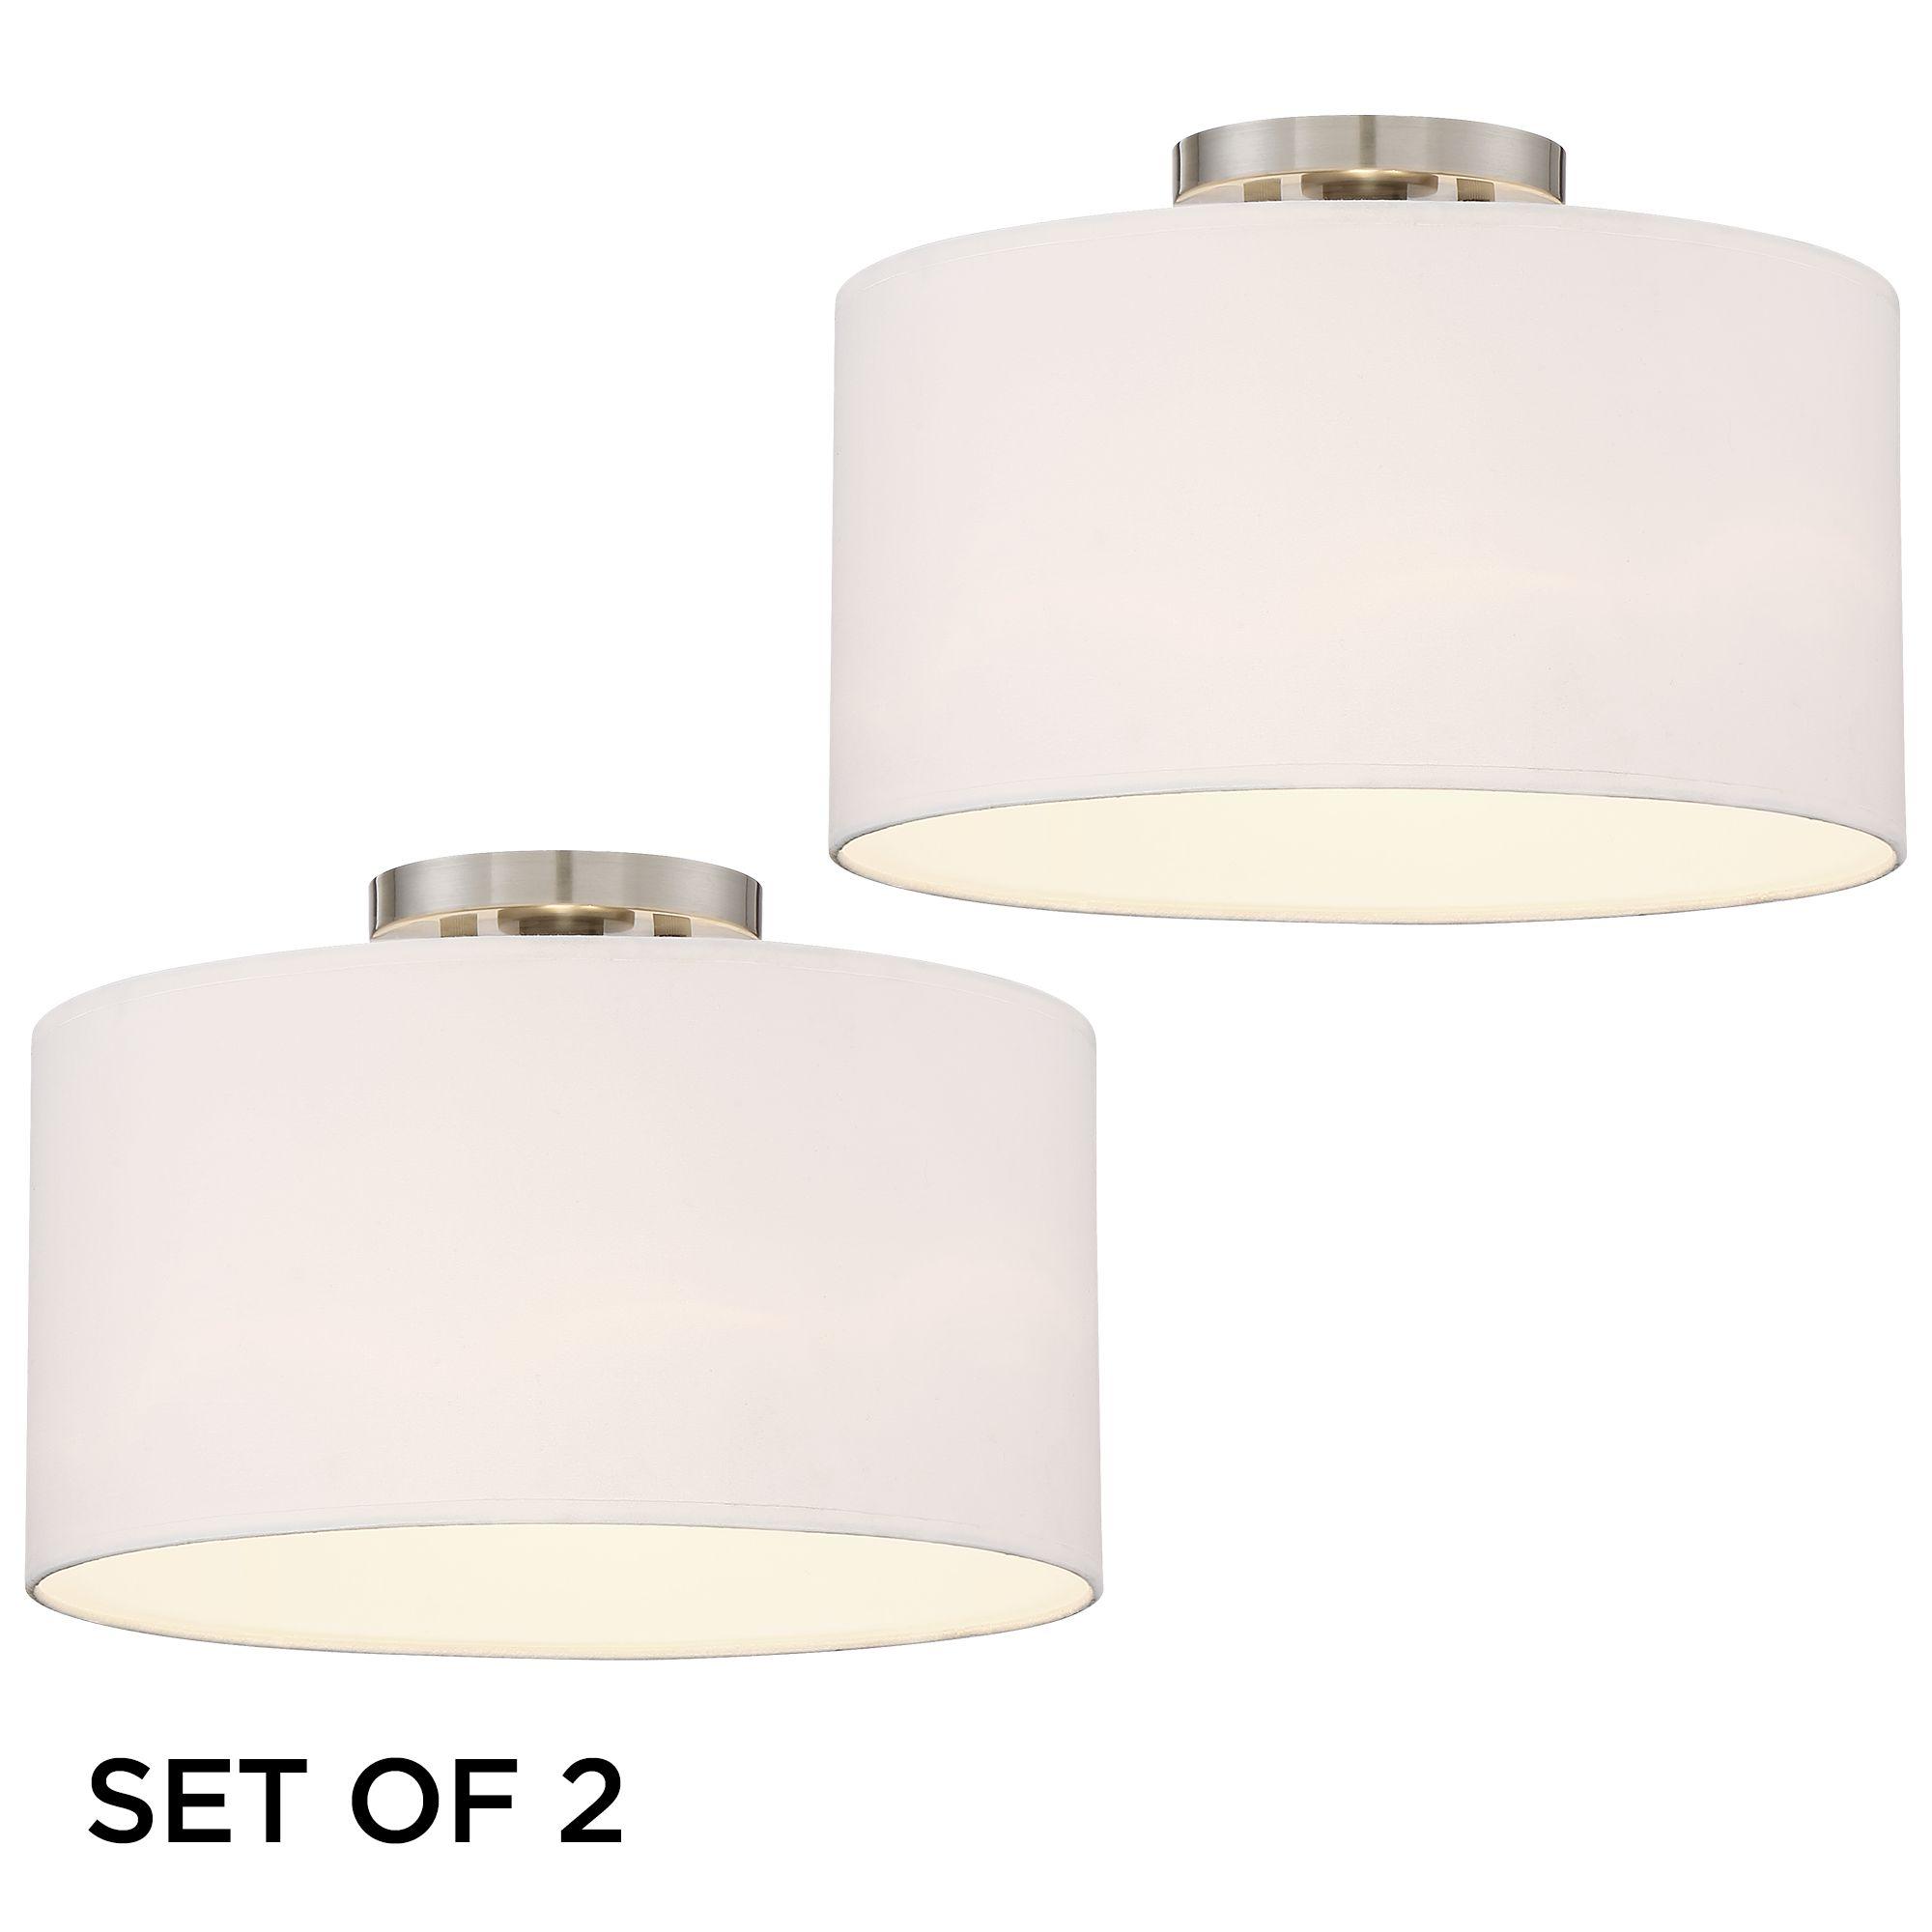 Set of 2 Adams Brushed Nickel White Drum Shade Ceiling Light